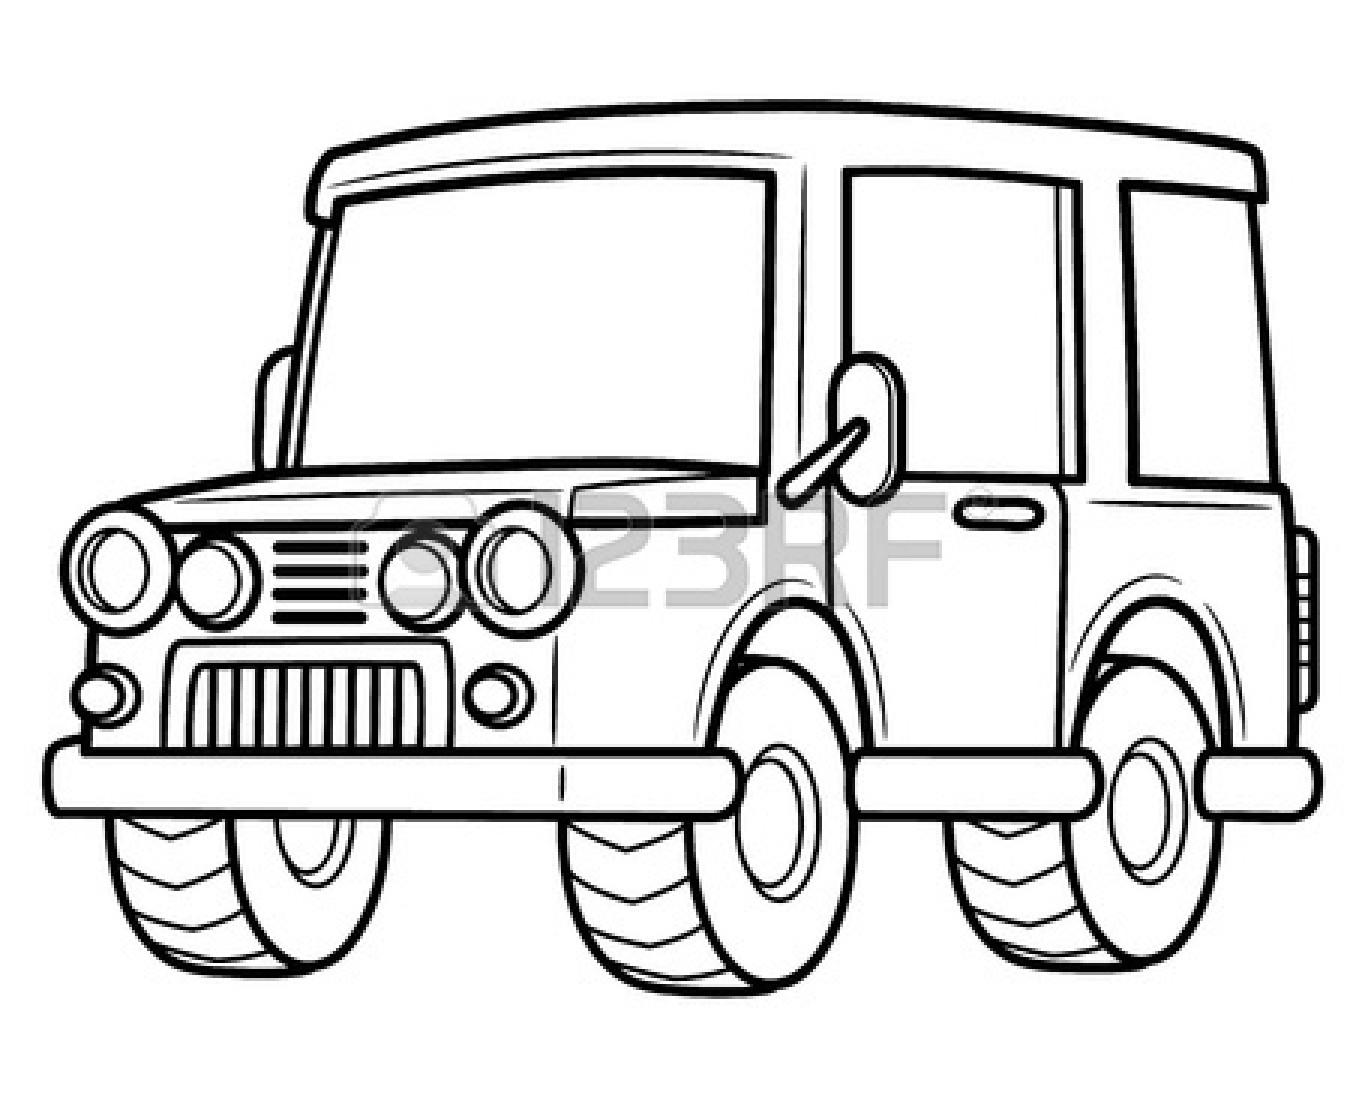 Fire Truck stock illustration. Illustration of fire, figure - 2137708 | 1098x1350